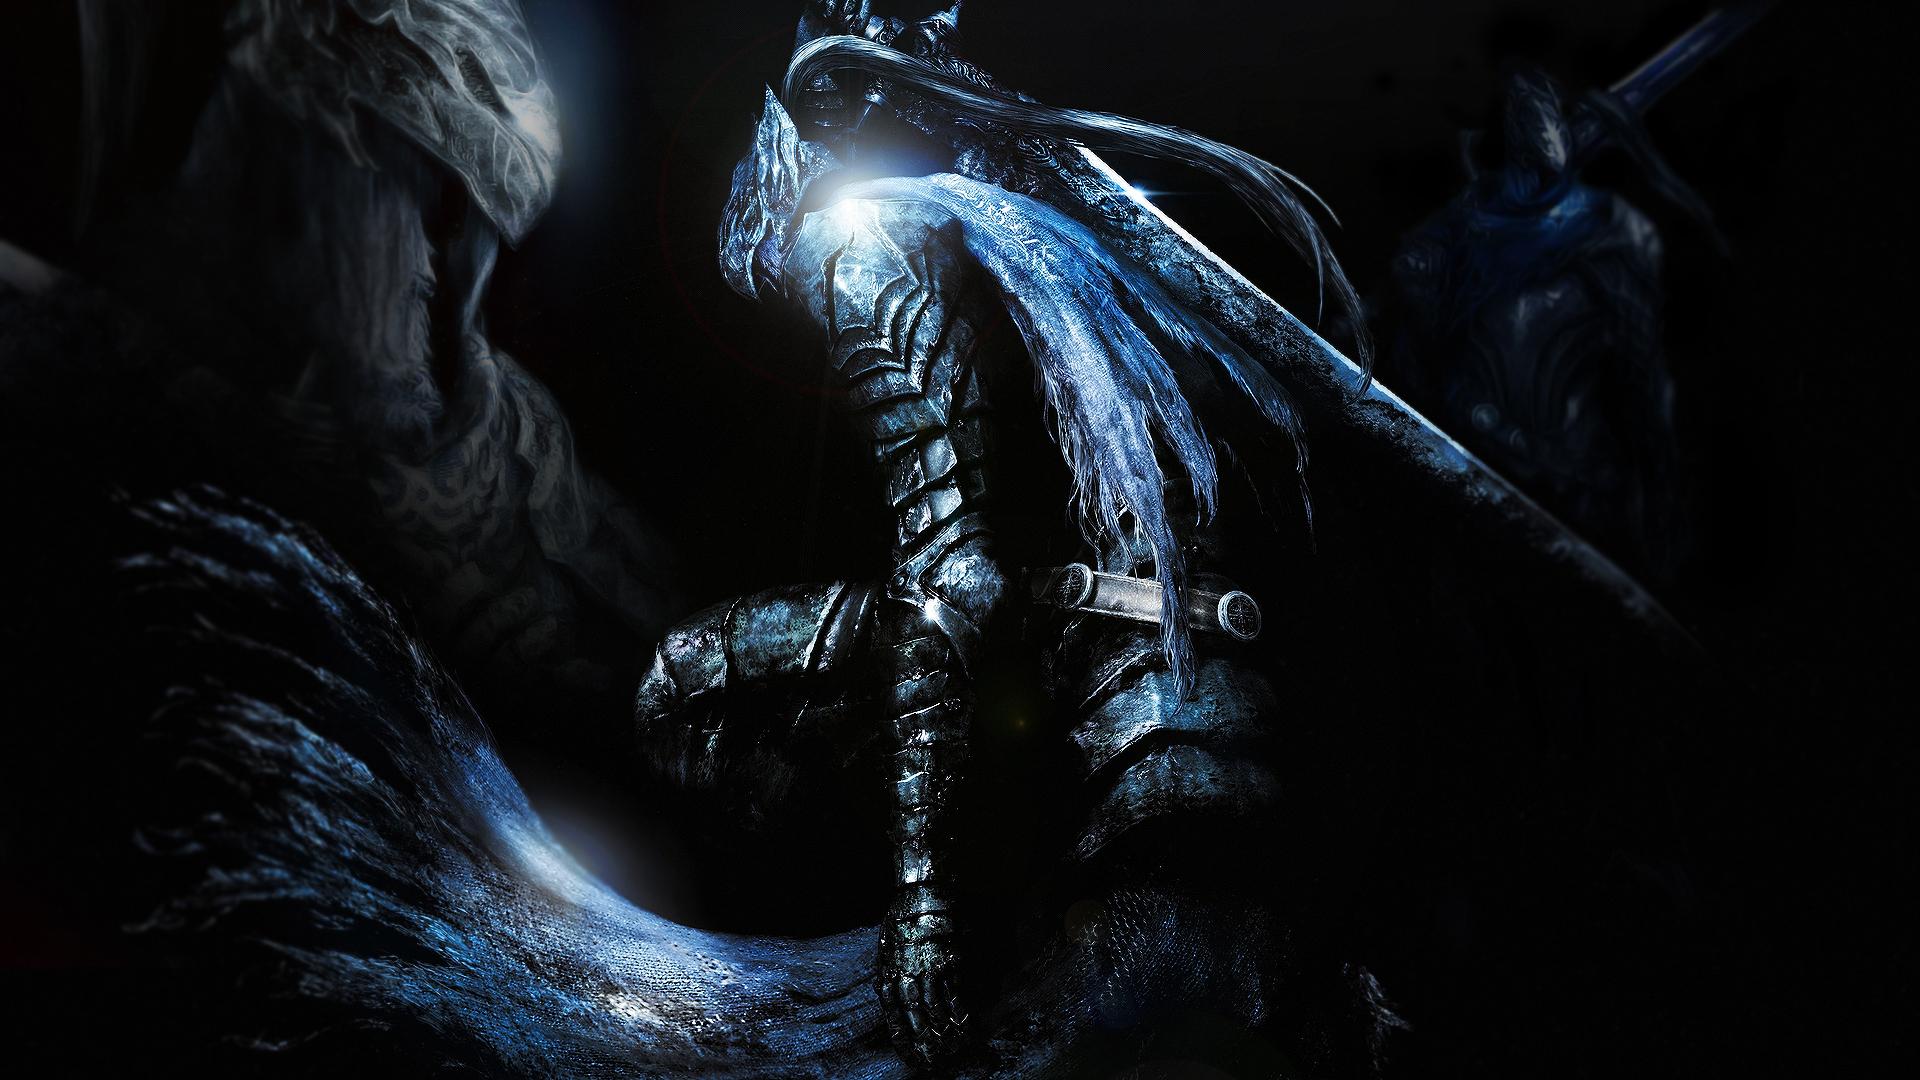 Video Game Character Collage Wallpaper Dark Souls Artorias wa...